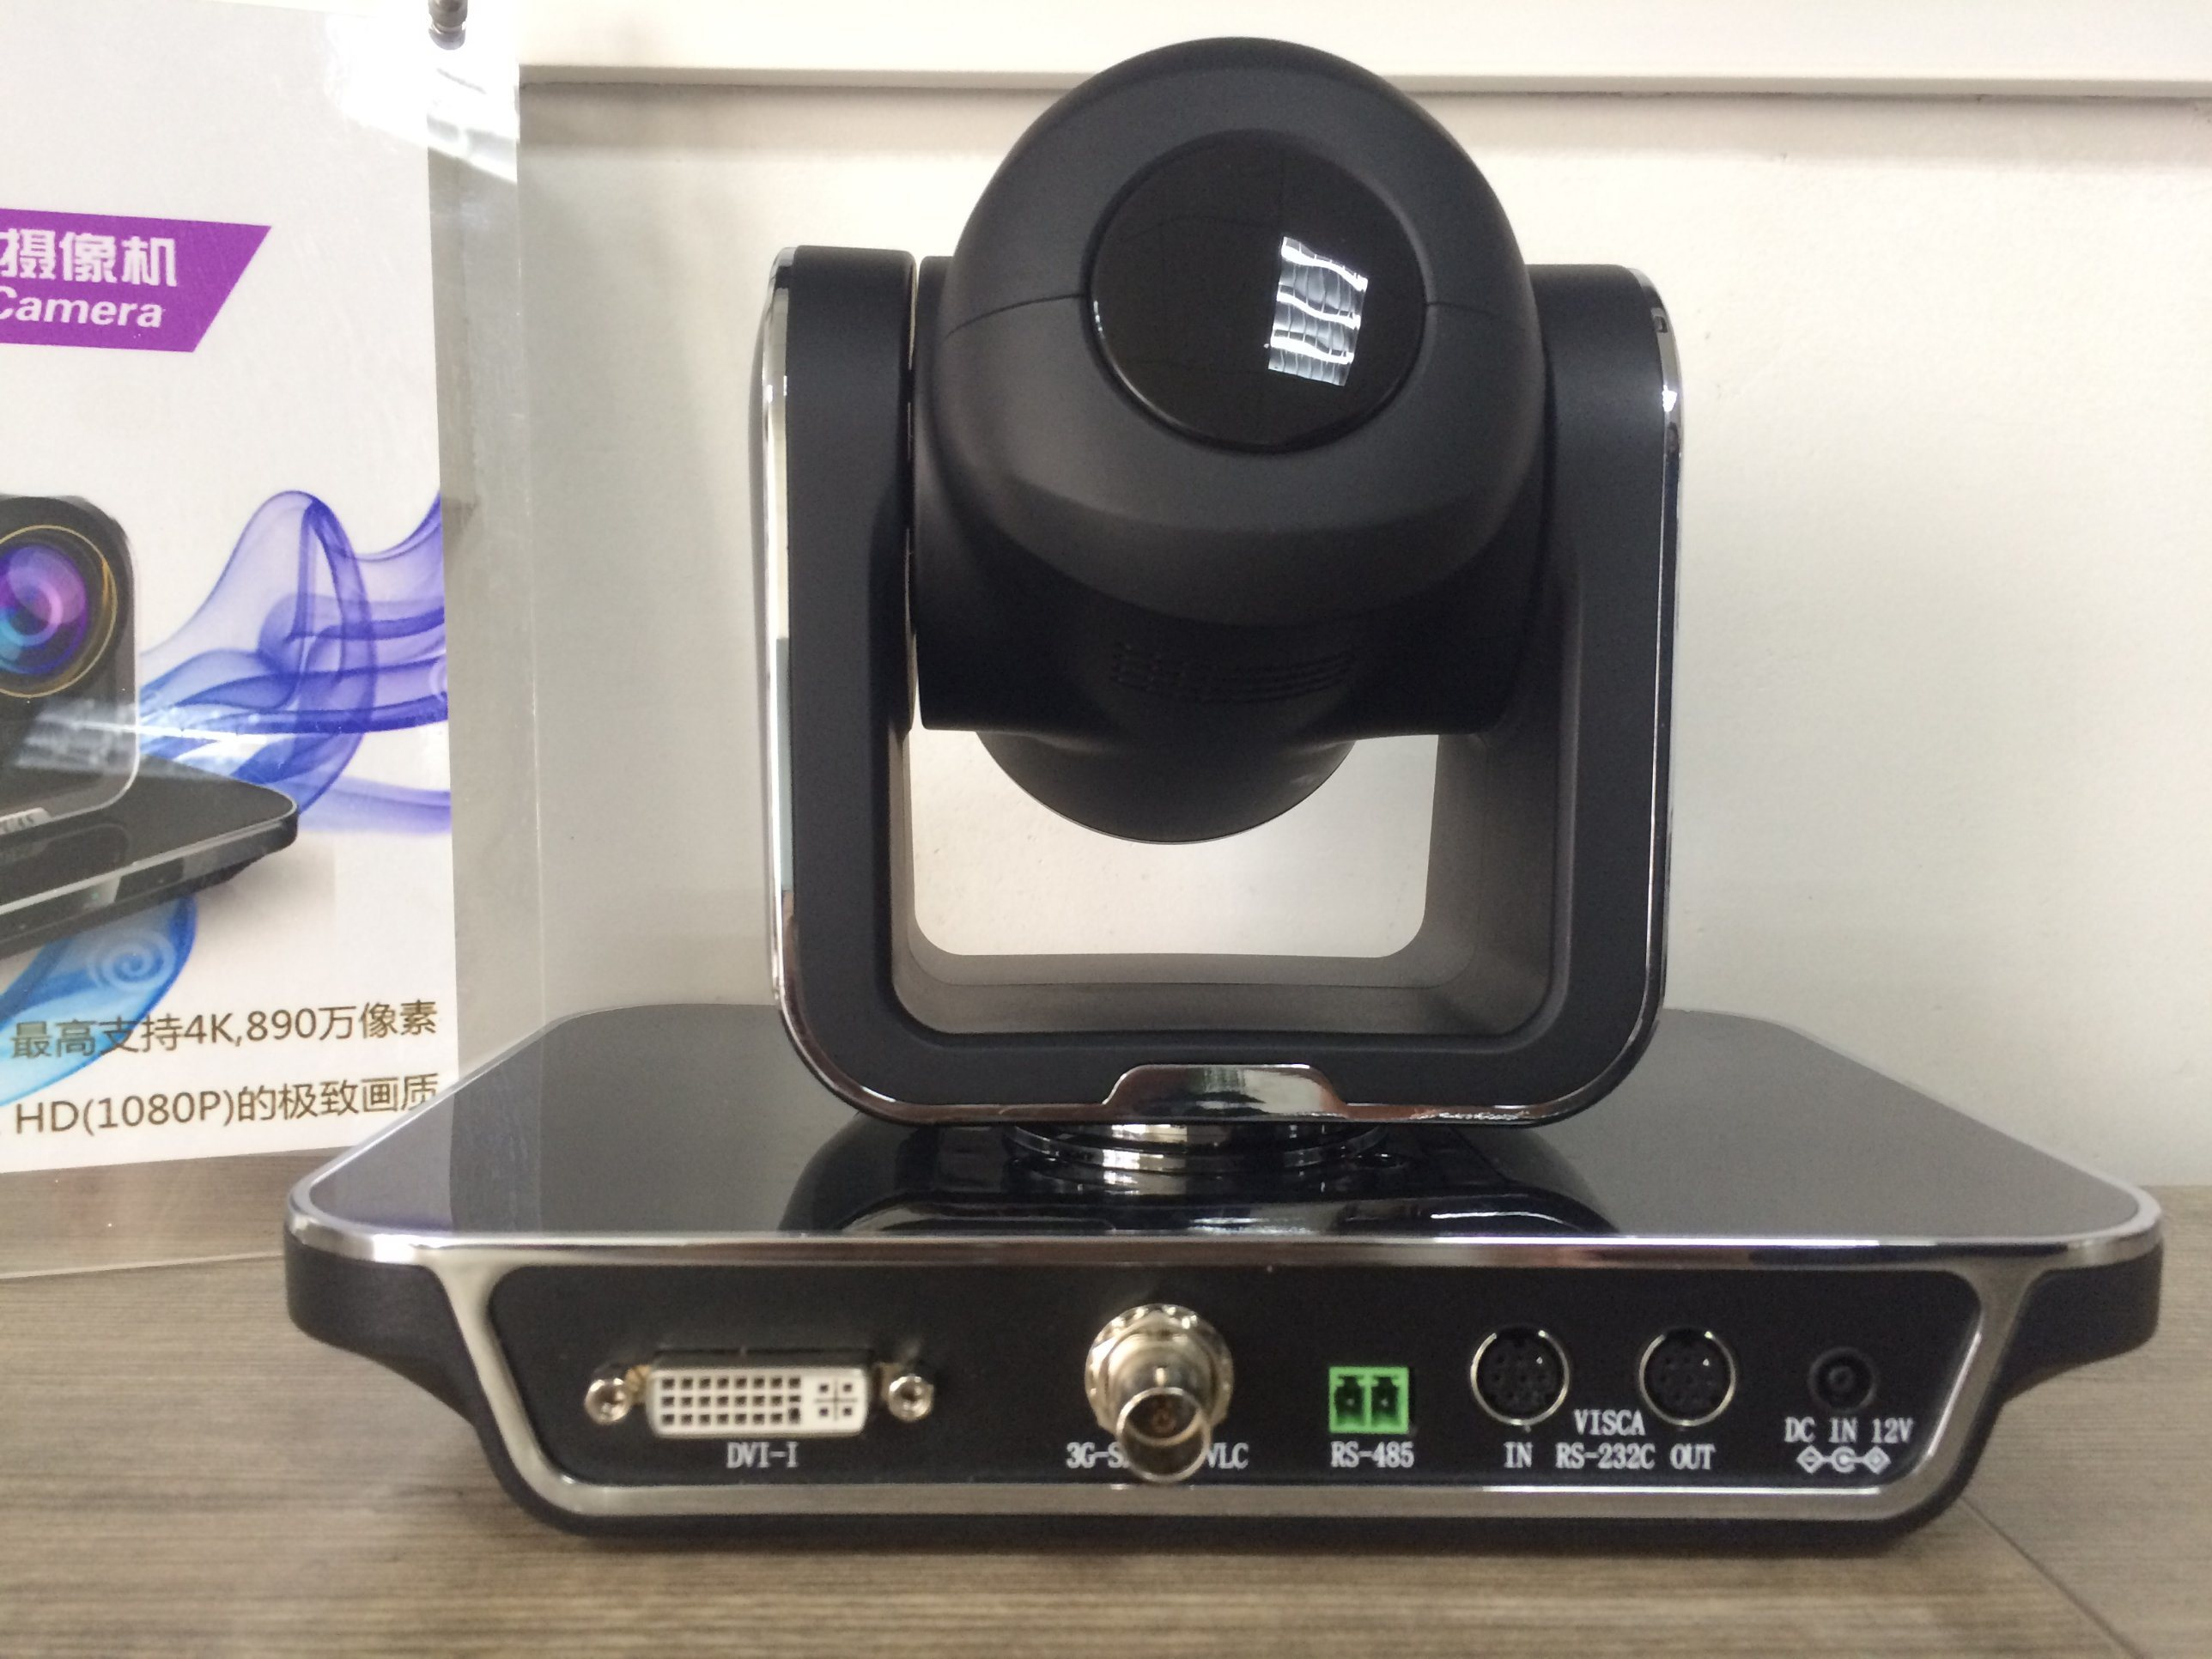 Hot Sale 1080P60 20xoptical 3.27MP HD PTZ Video Conference Camera (PUS-OHD320)